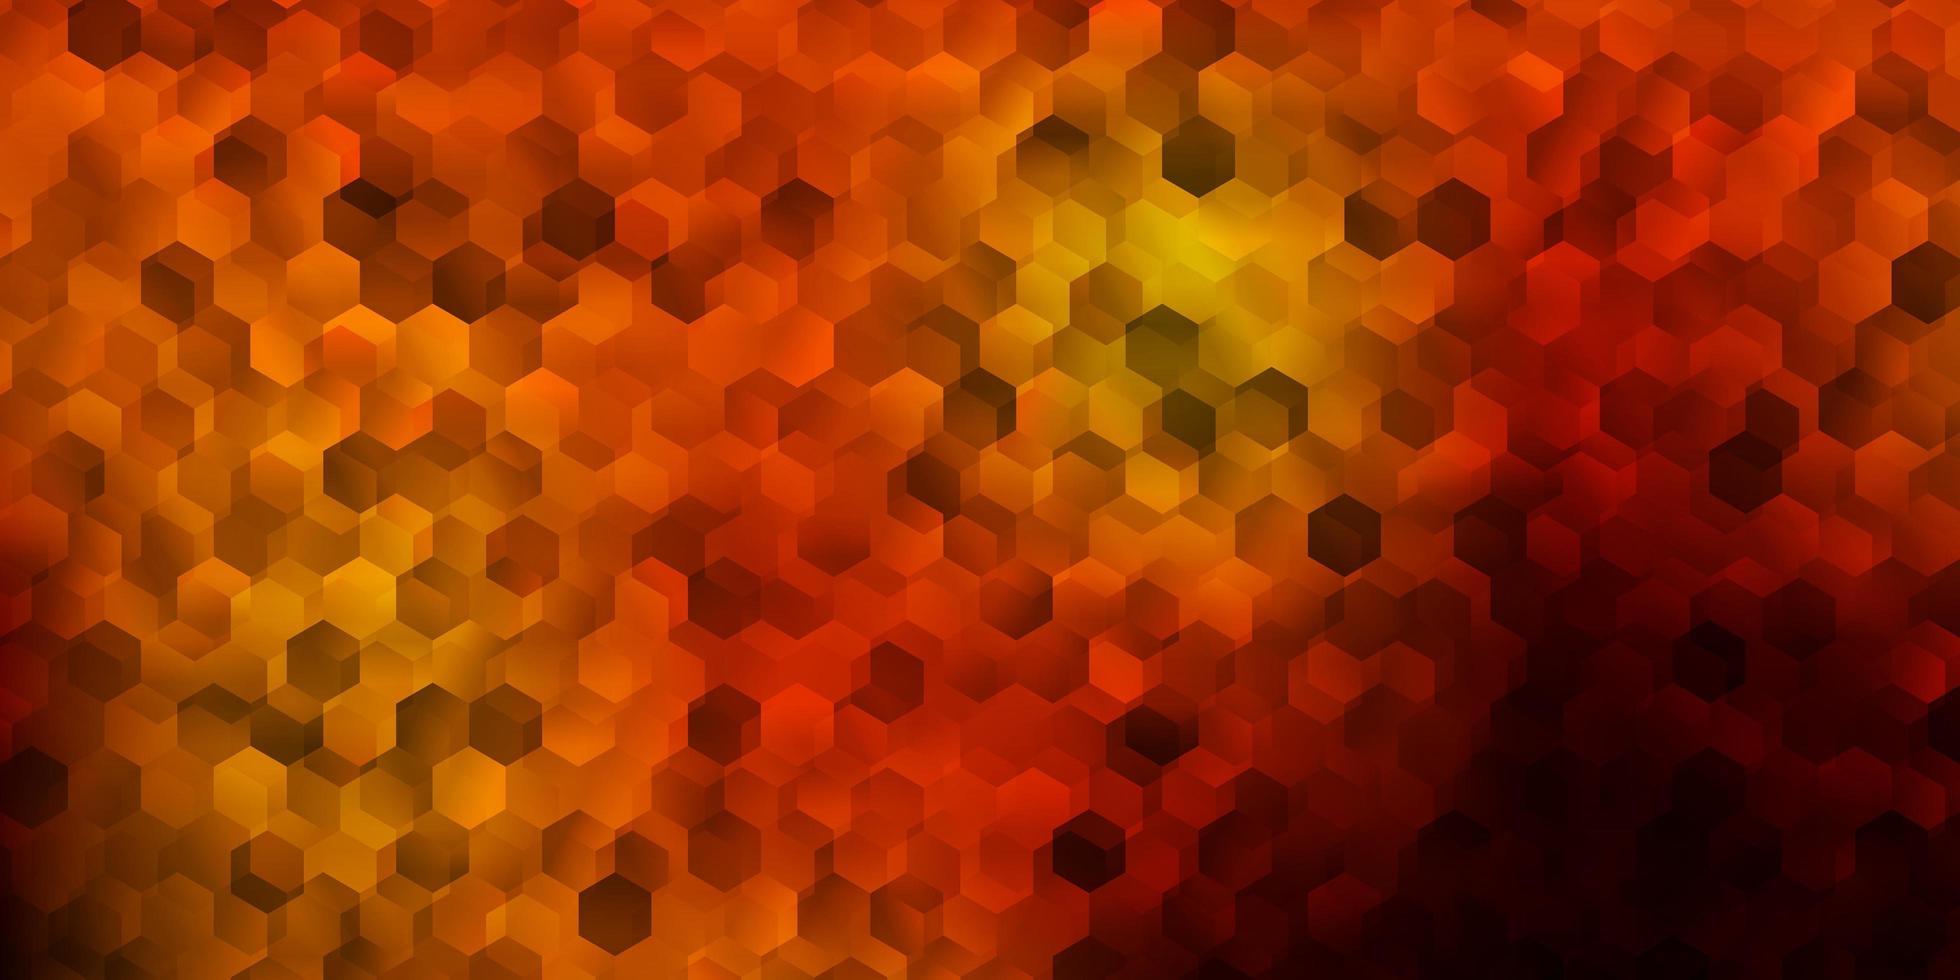 Dark orange background with hexagonal shapes. vector